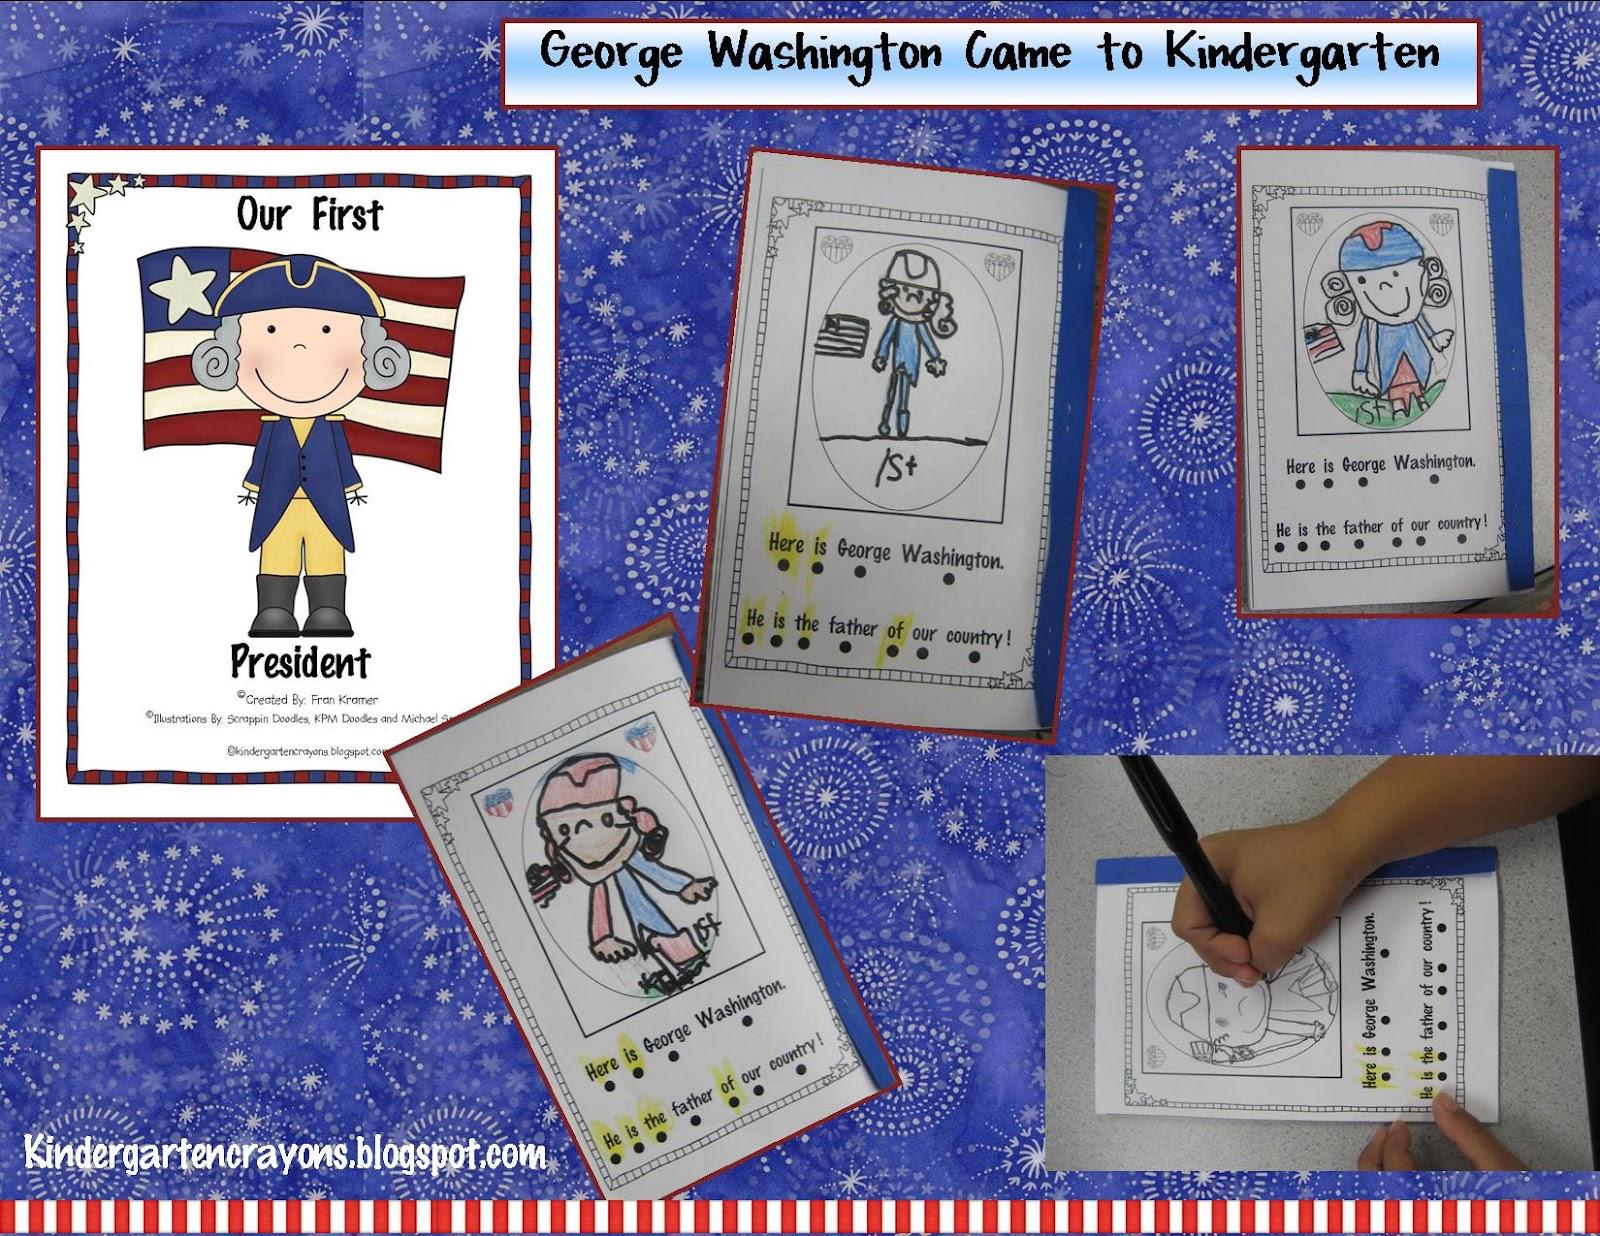 Kindergarten Crayons History Reinvented Kinder Style